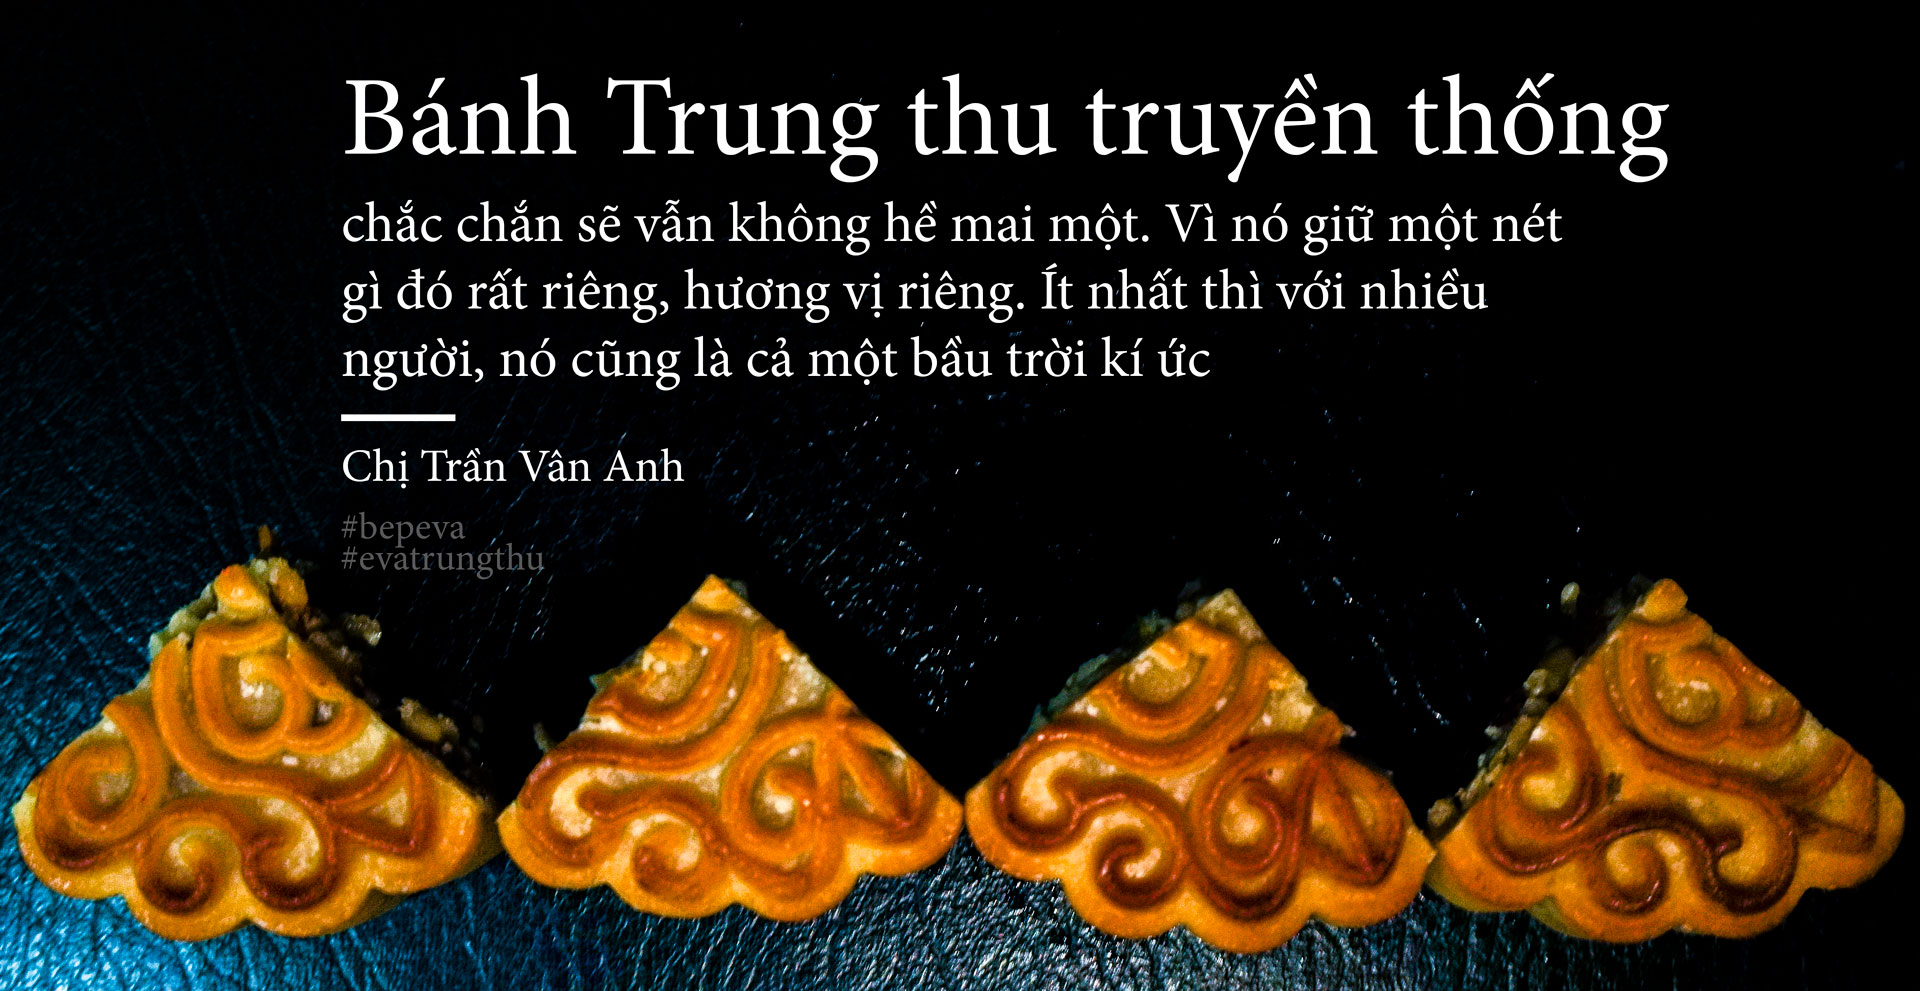 """voi toi, co mot loai banh trung thu mang ten ky uc"" - 16"